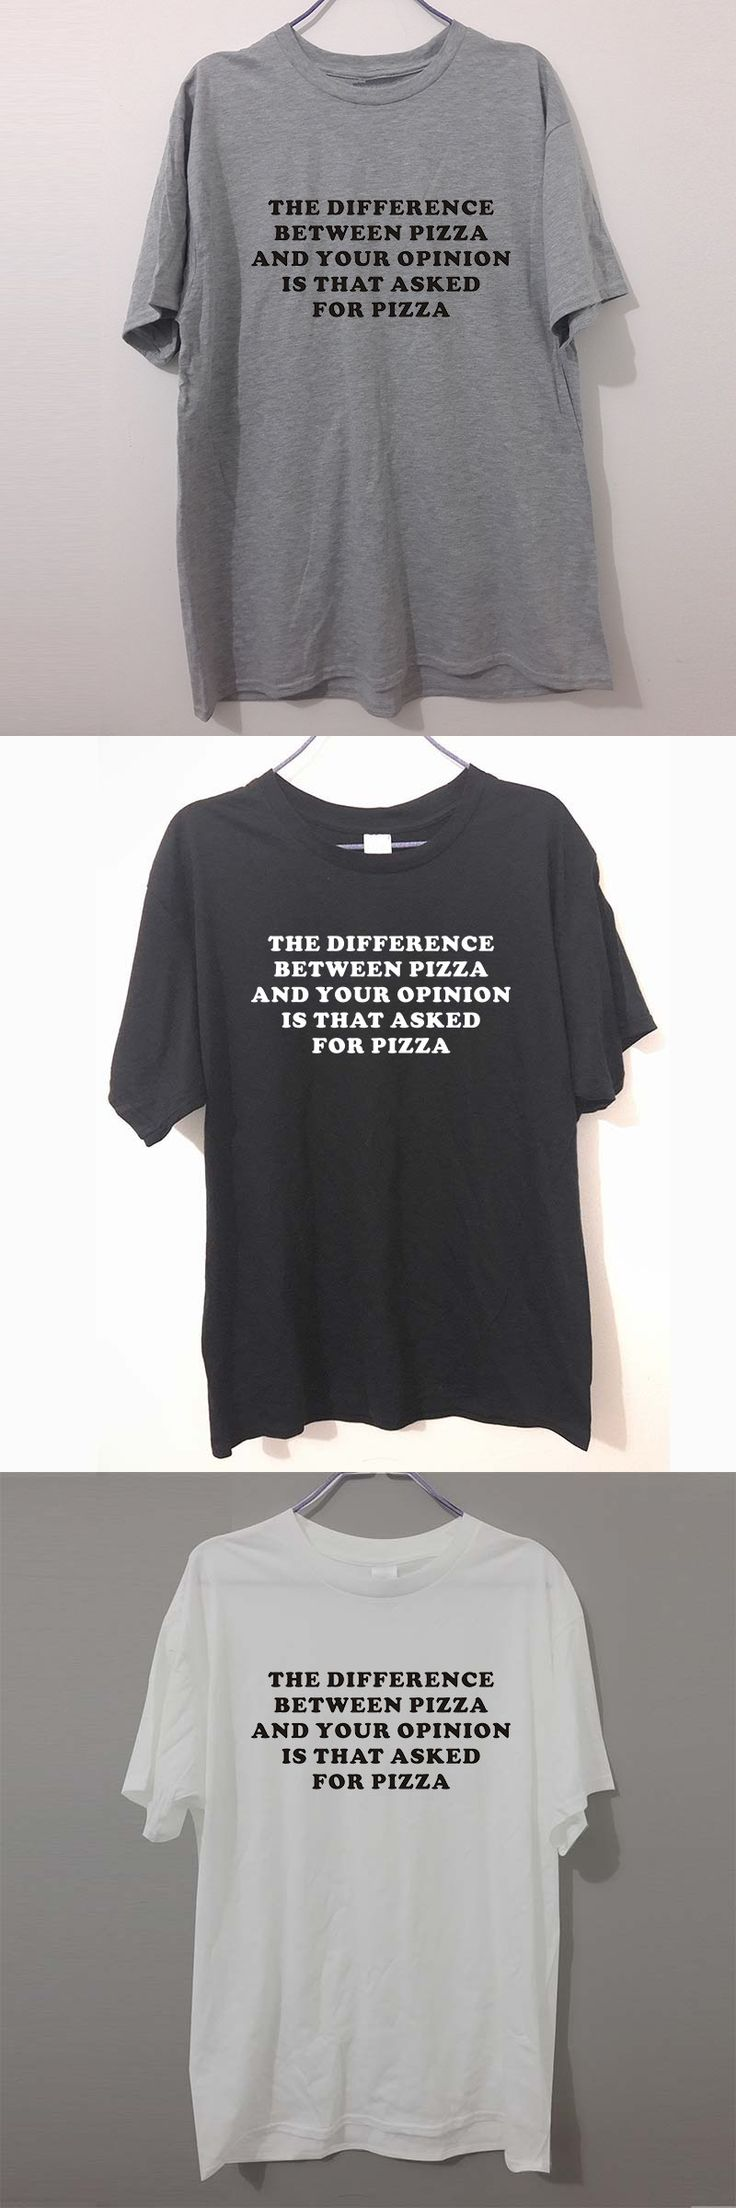 Fashion Brand PIZZA SLOGAN PRINTED Camisetas men's short sleeve T-shirt cotton Round collar white gray Black programmer T Shirt